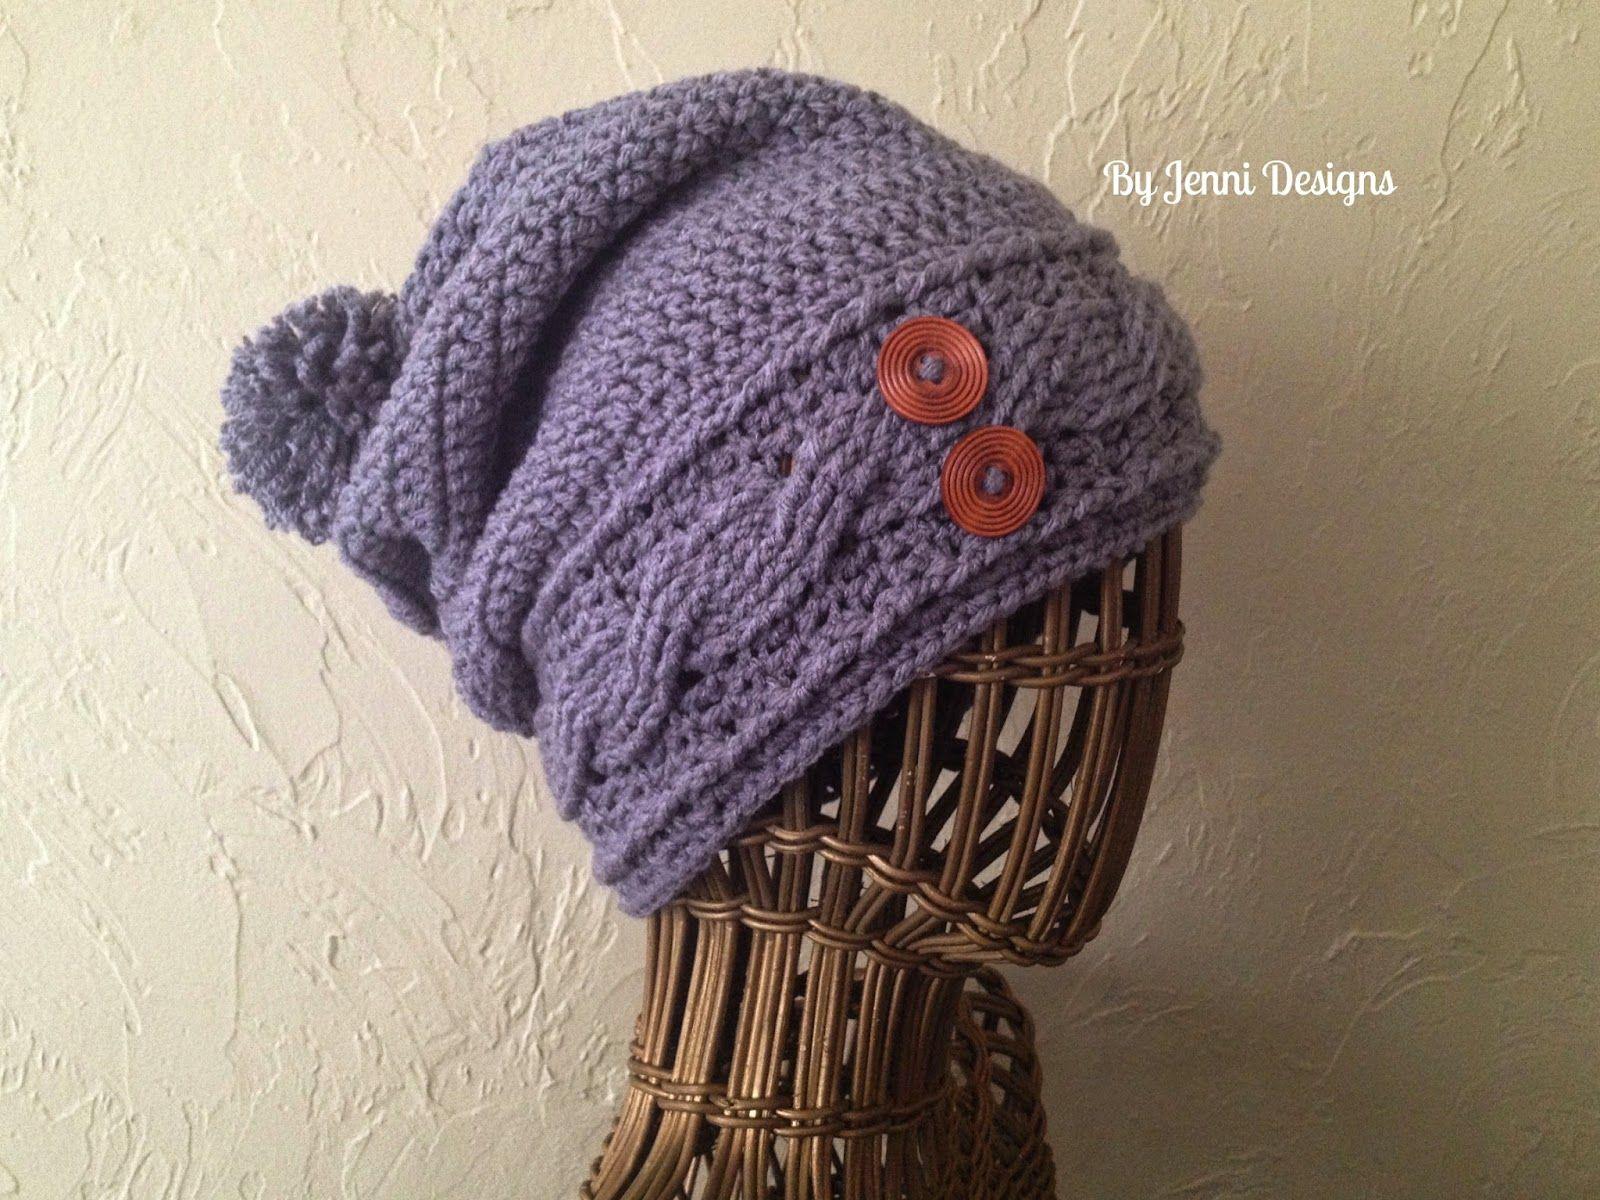 By Jenni Designs: Crochet Women\'s Slouchy Cable Hat, Free Pattern ...